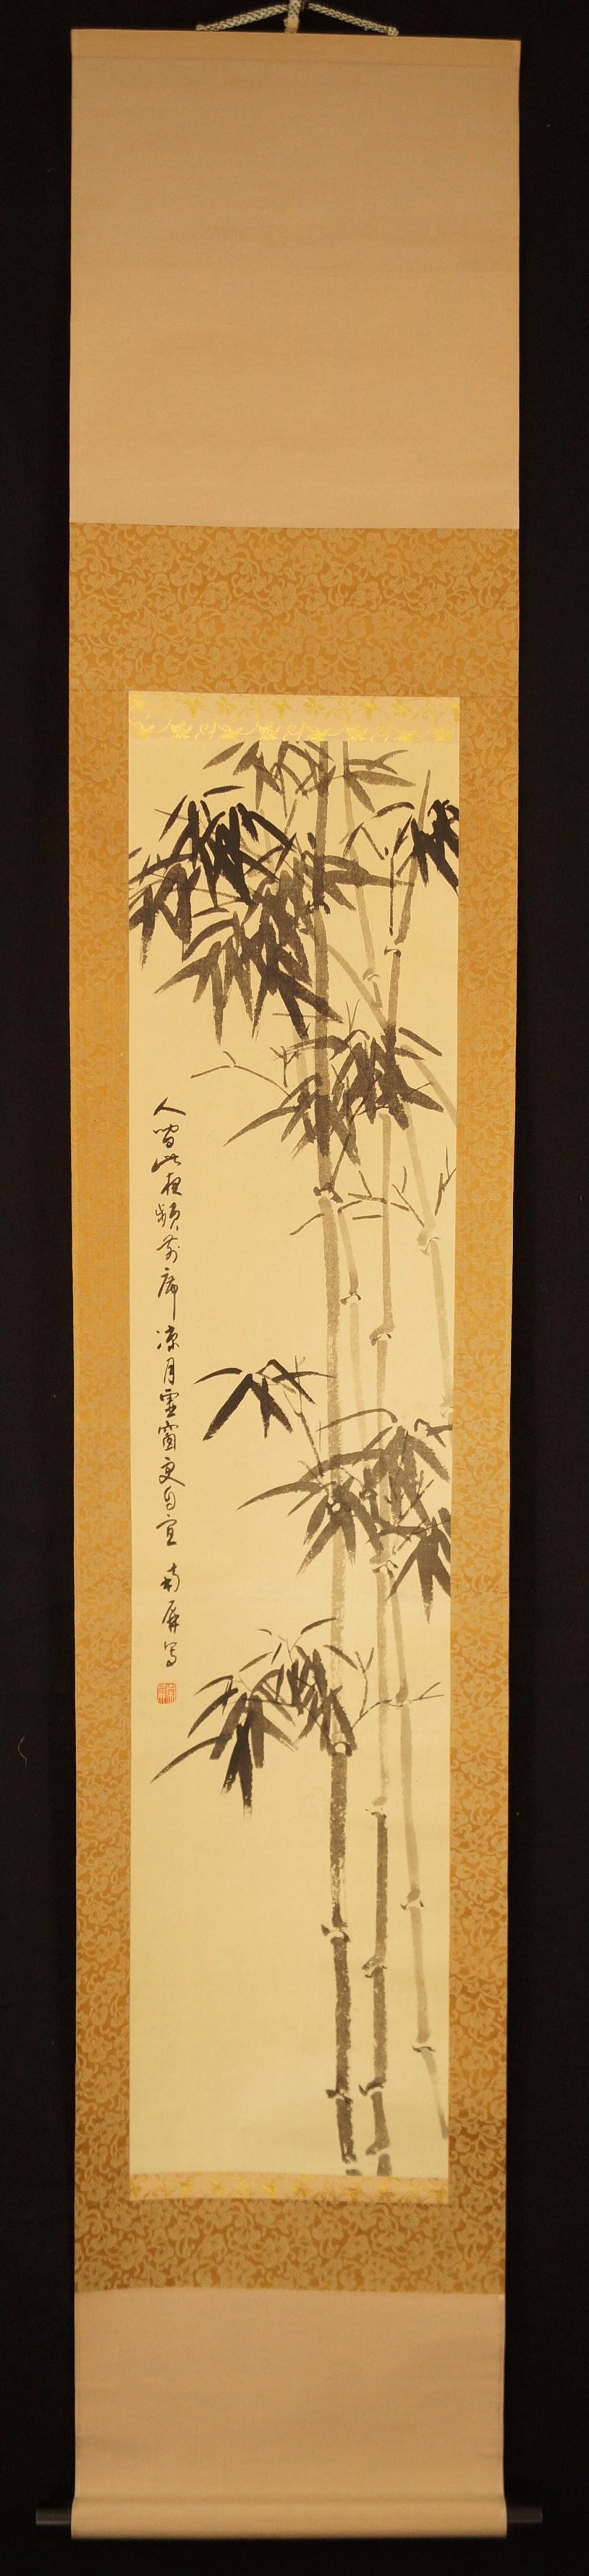 Bambus - japanisches Rollgemälde (Kakejiku, Kakemono)